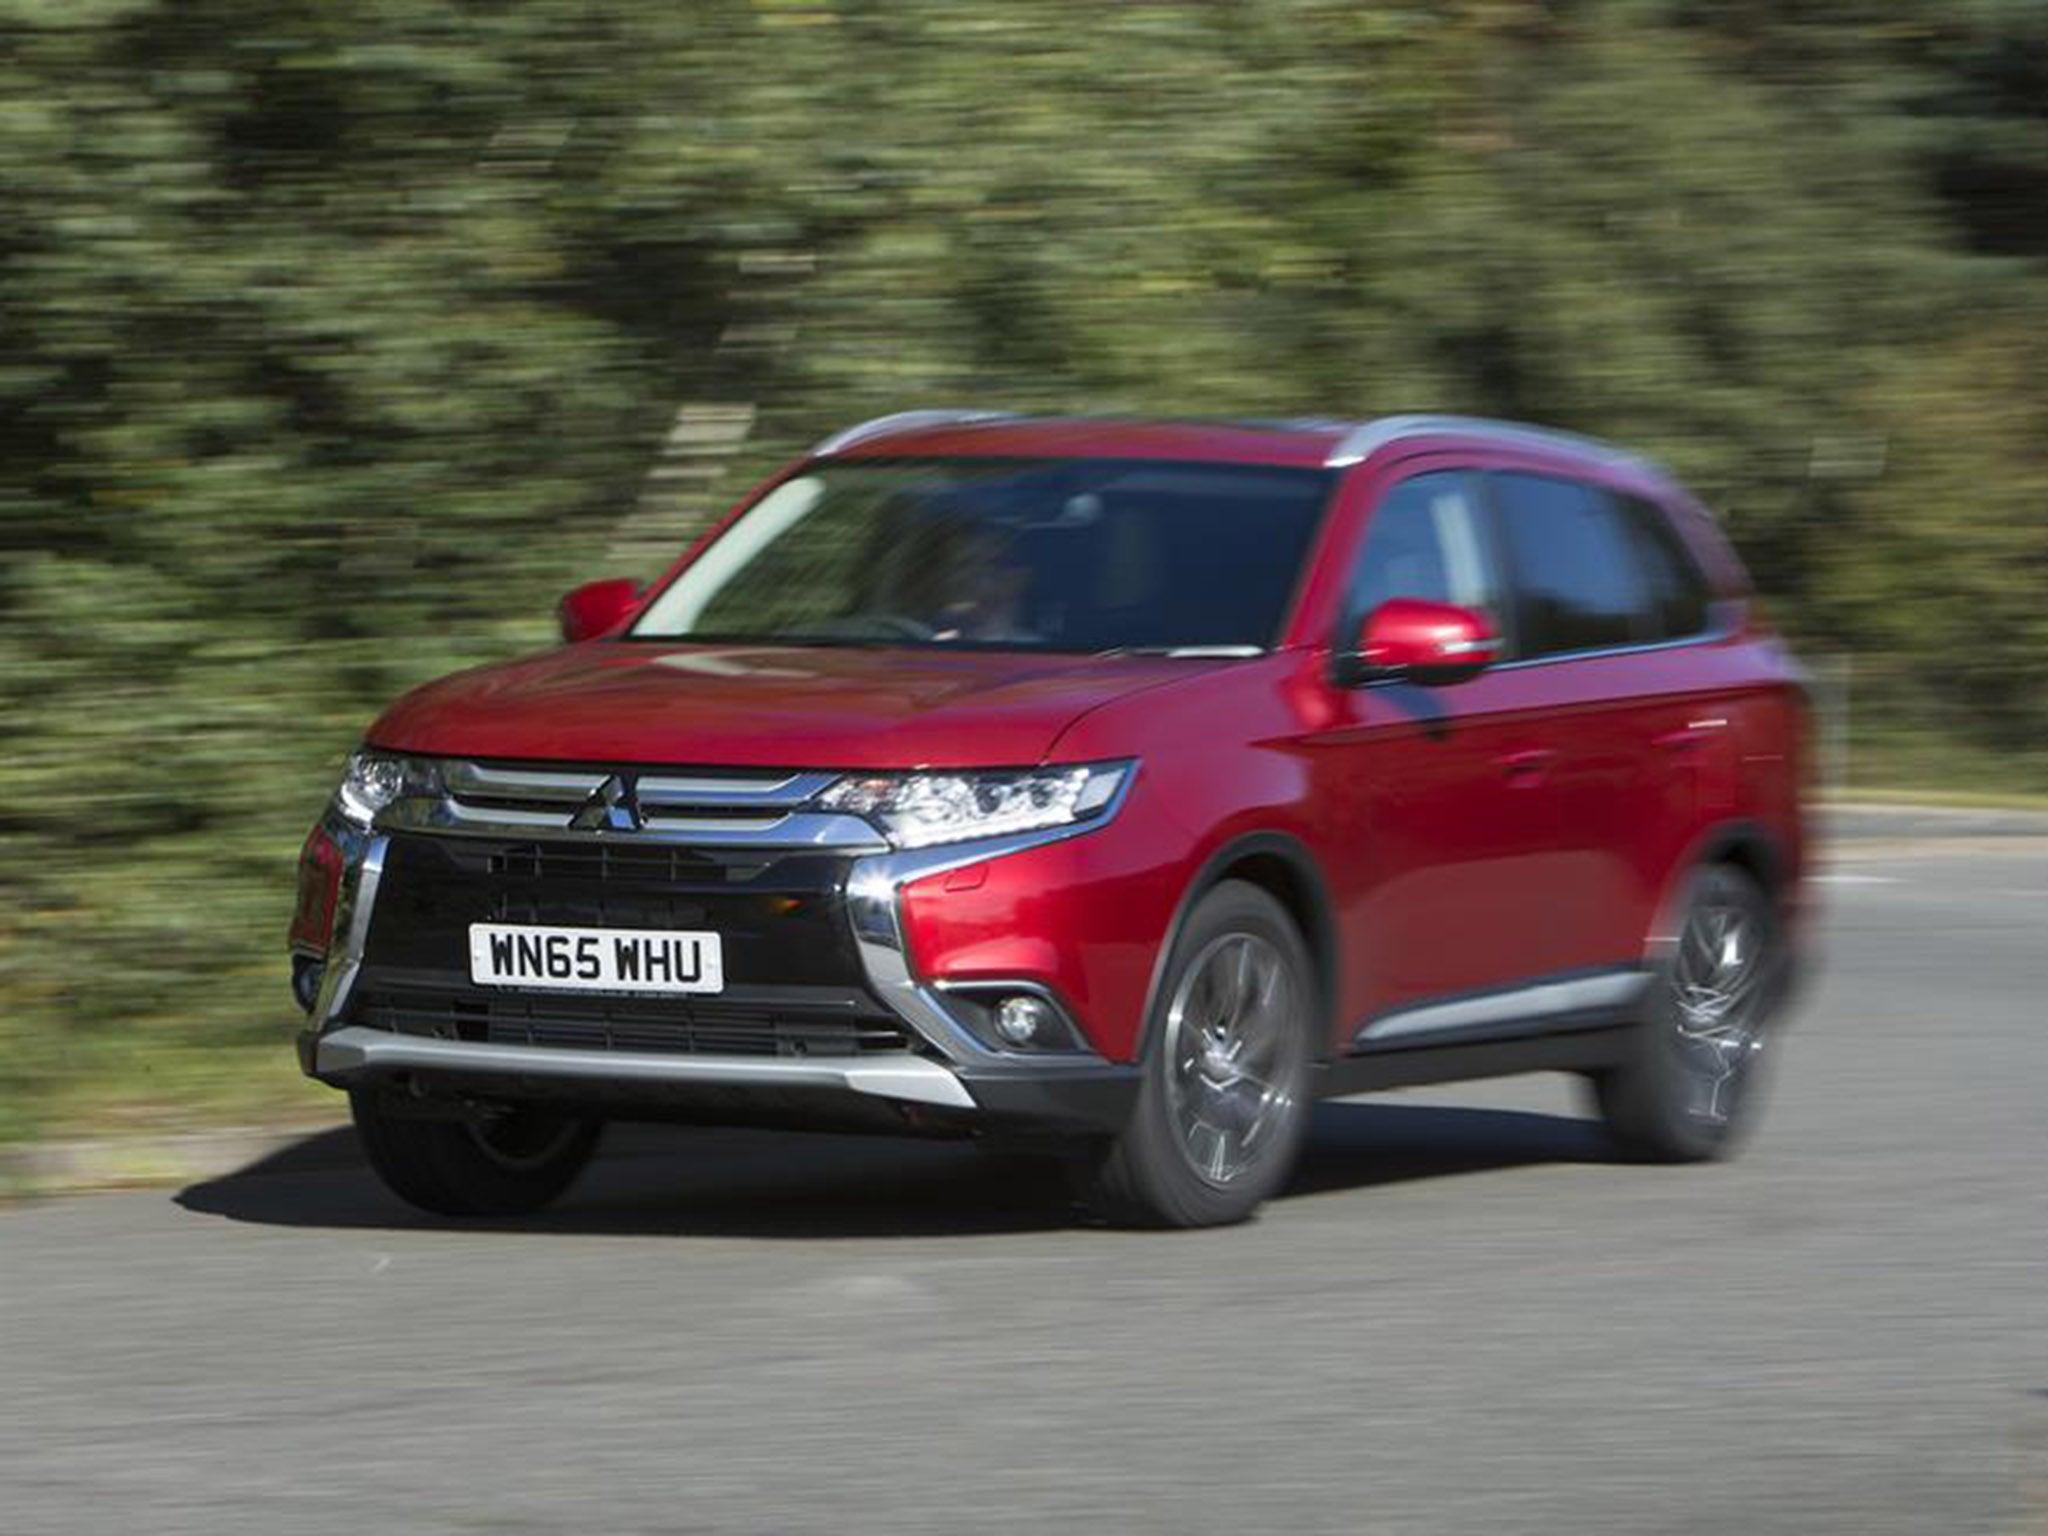 Mitsubishi Outlander 2 2 DI-D, car review: Significant updates add